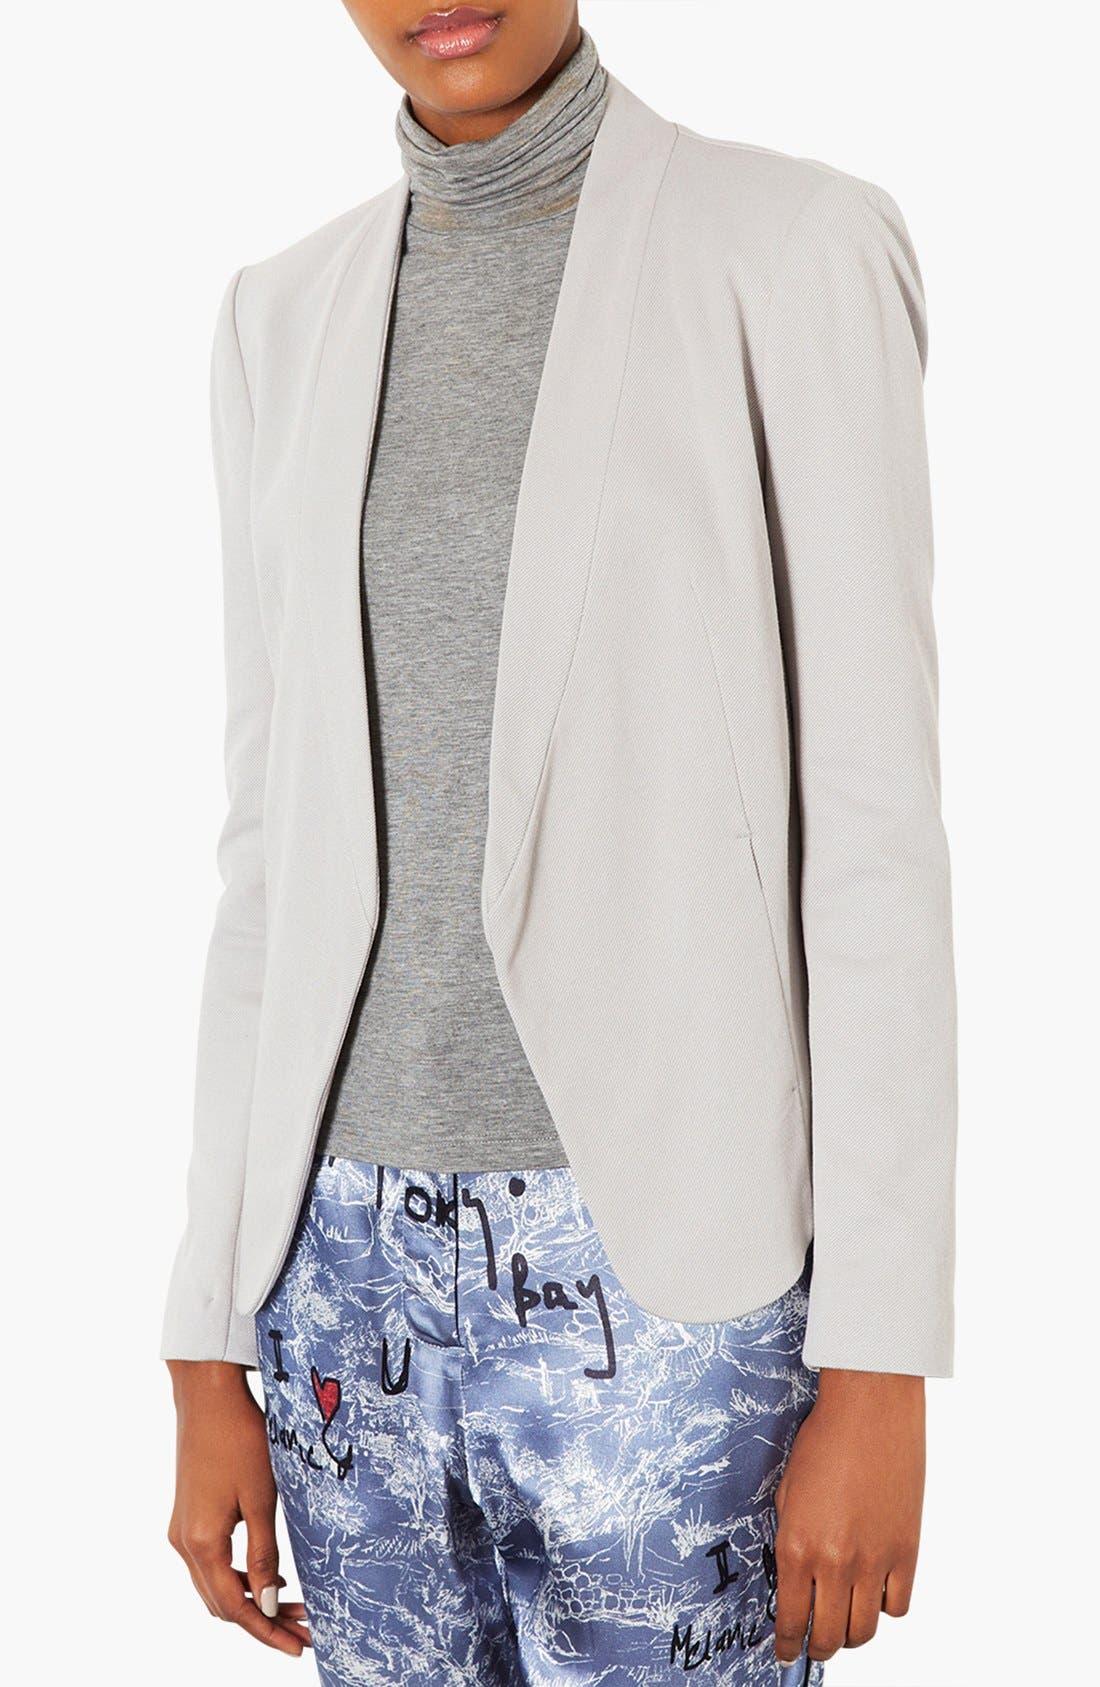 Alternate Image 1 Selected - Topshop 'Darcy' Textured Blazer